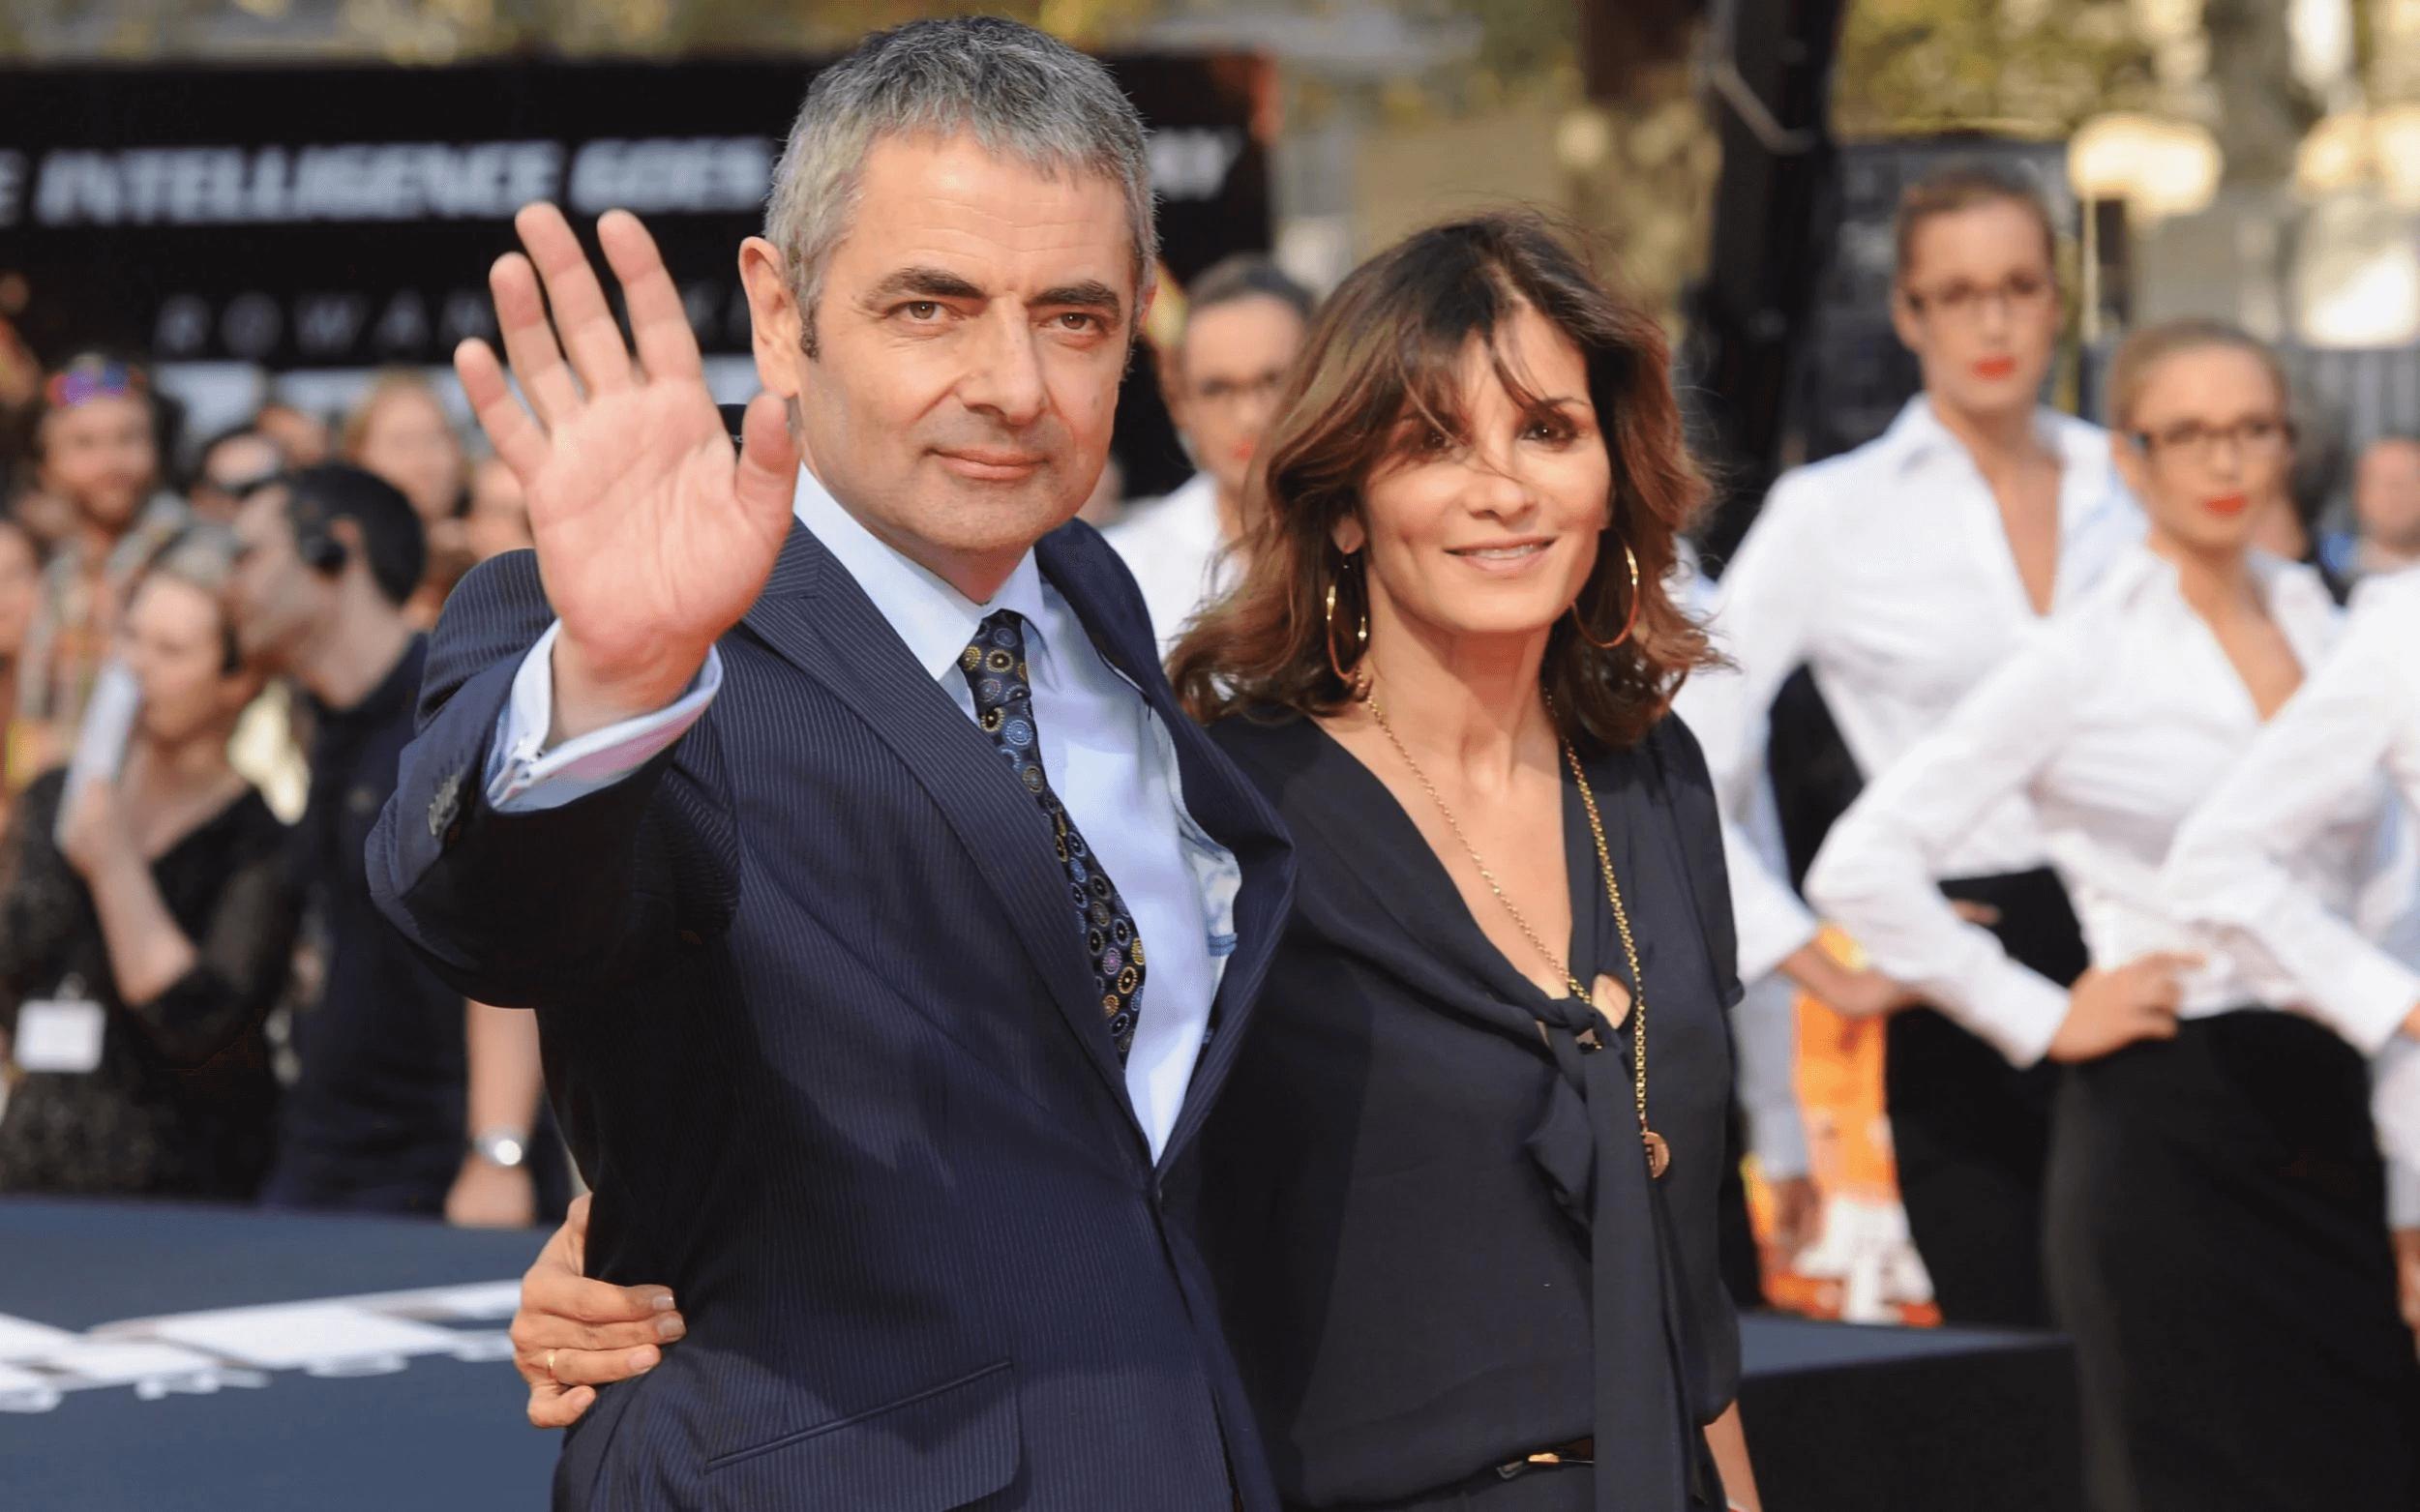 Rowan Atkinson with his ex-wife Sunetra Sastry